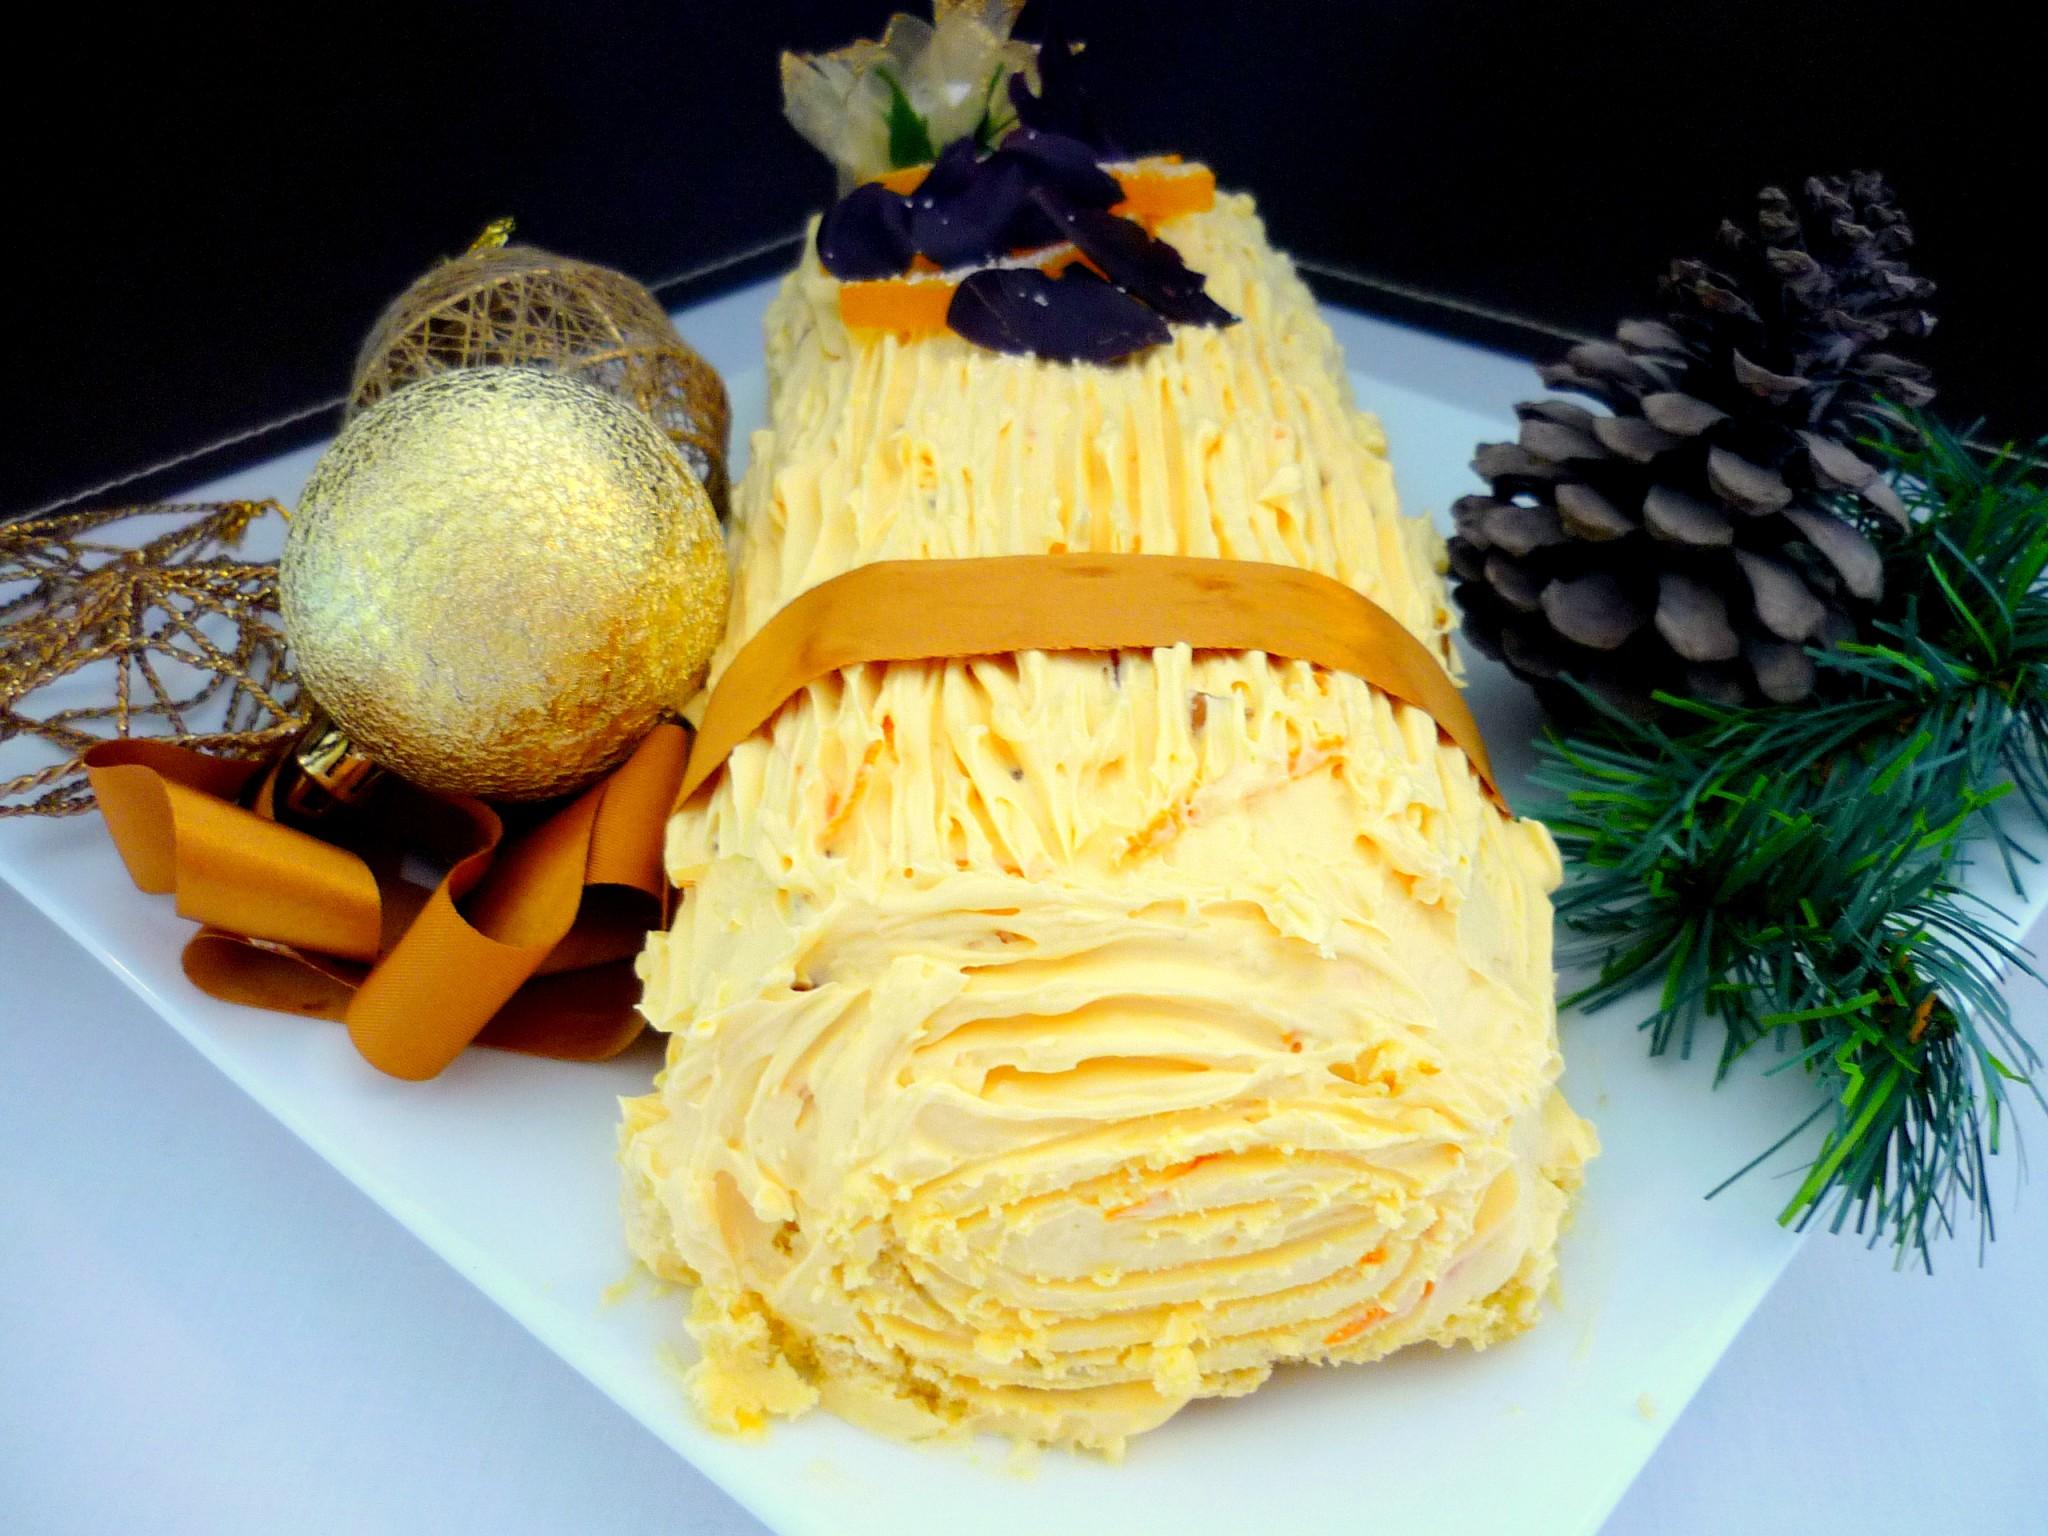 buche de noel 2018 lorraine French Christmas log   Bûche de Noël   French Moments buche de noel 2018 lorraine